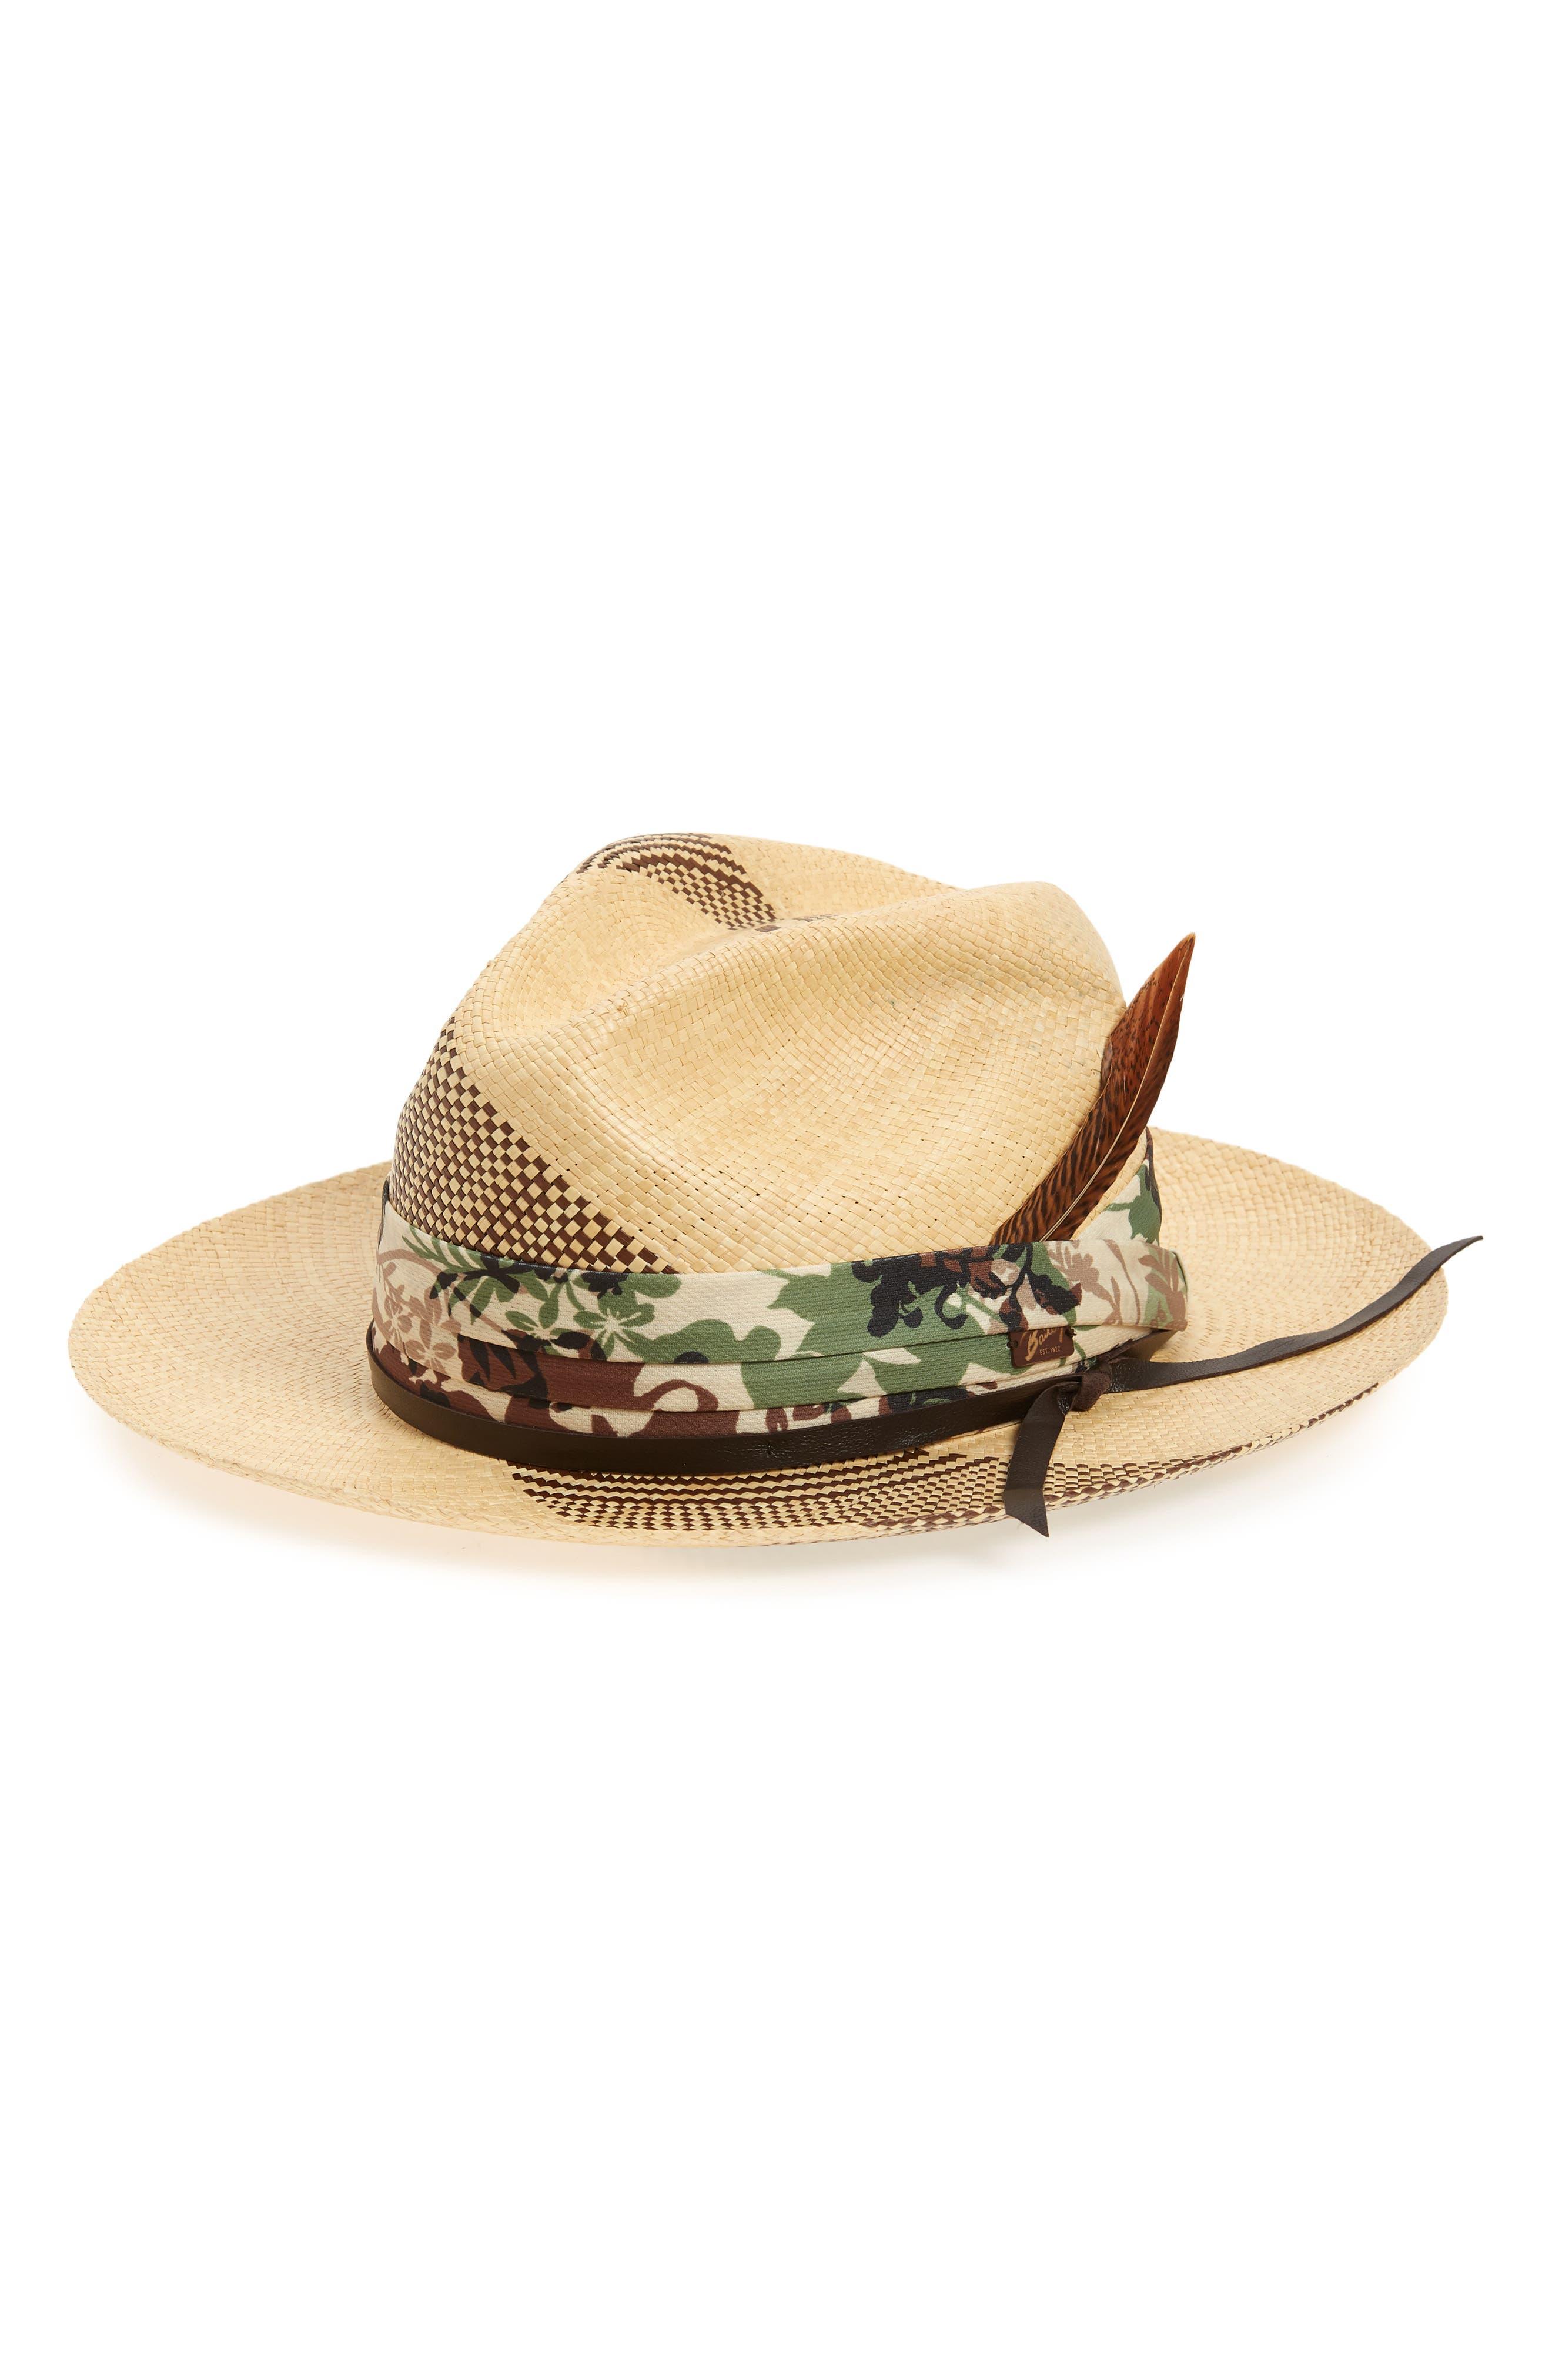 Rayney Straw Panama Hat,                         Main,                         color, Natural/ Brown